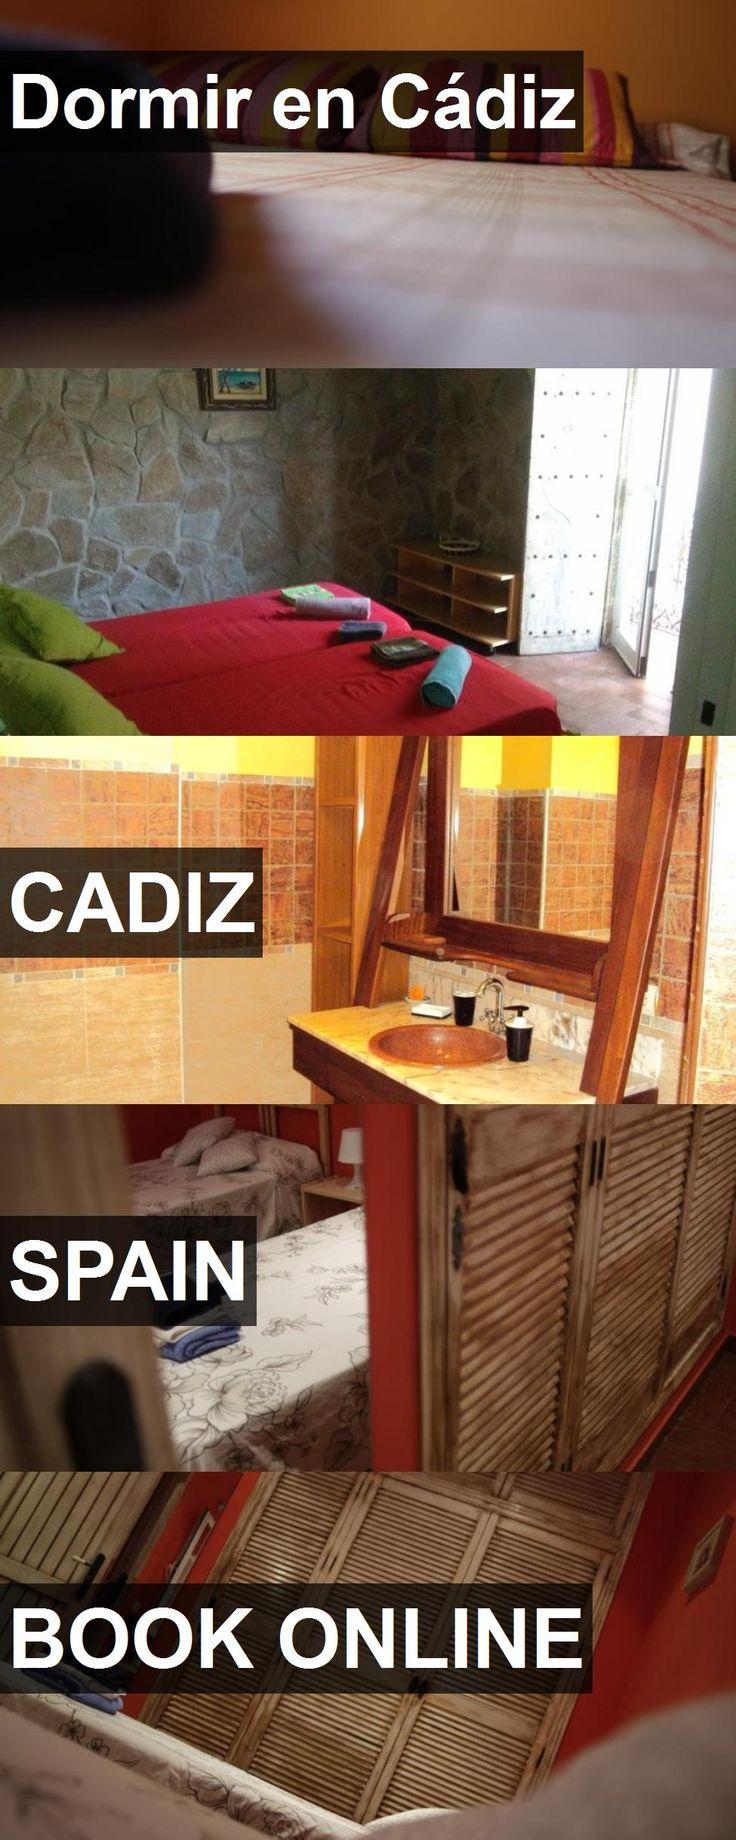 Hotel Dormir en Cádiz in Cadiz, Spain. For more information, photos, reviews and best prices please follow the link. #Spain #Cadiz #travel #vacation #hotel